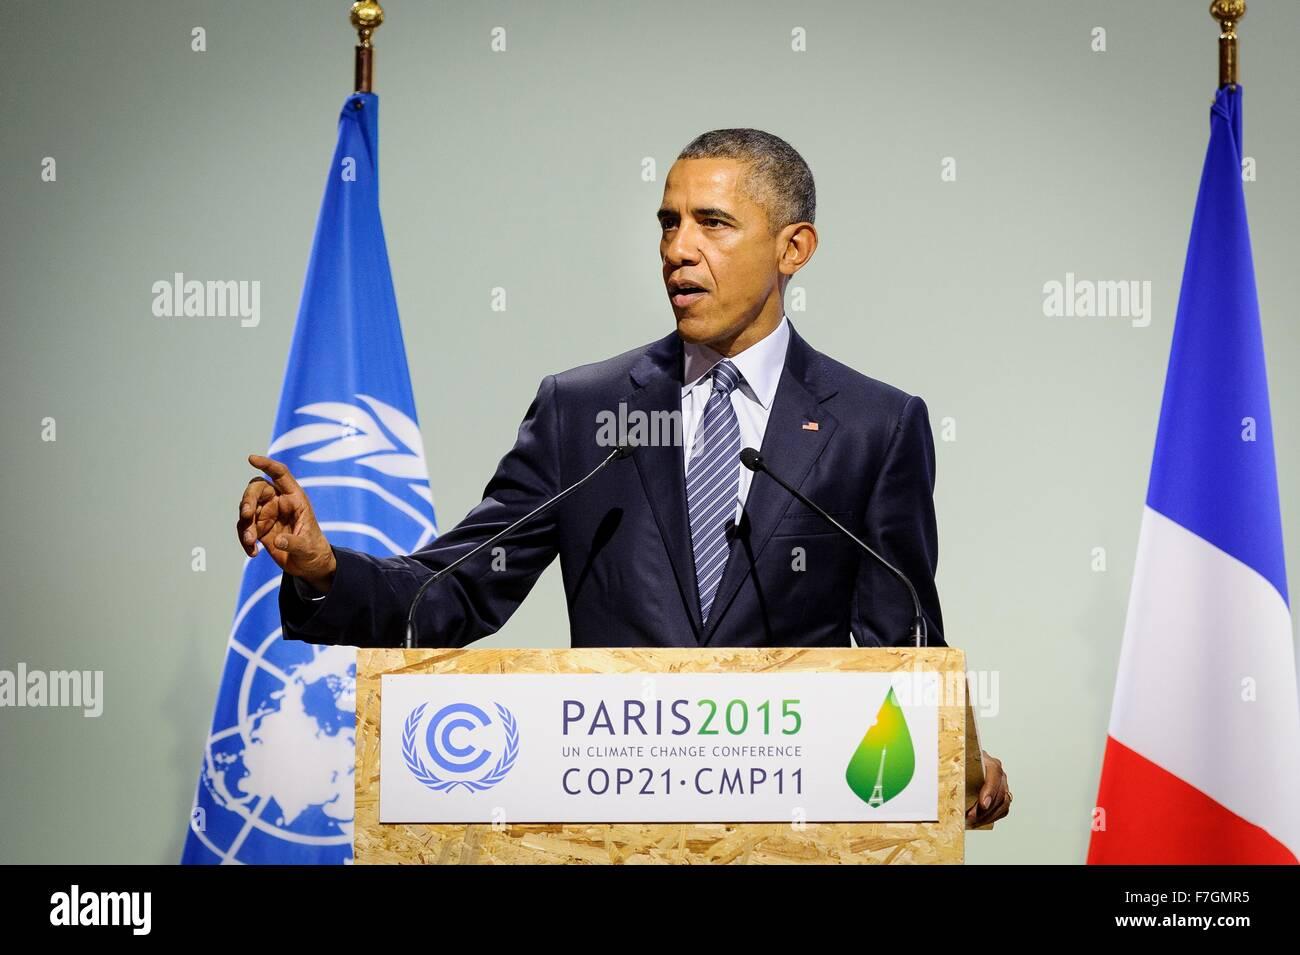 Le Bourget, France. 30th November, 2015. U.S. President Barack Obama addresses the plenary session of the COP21, - Stock Image